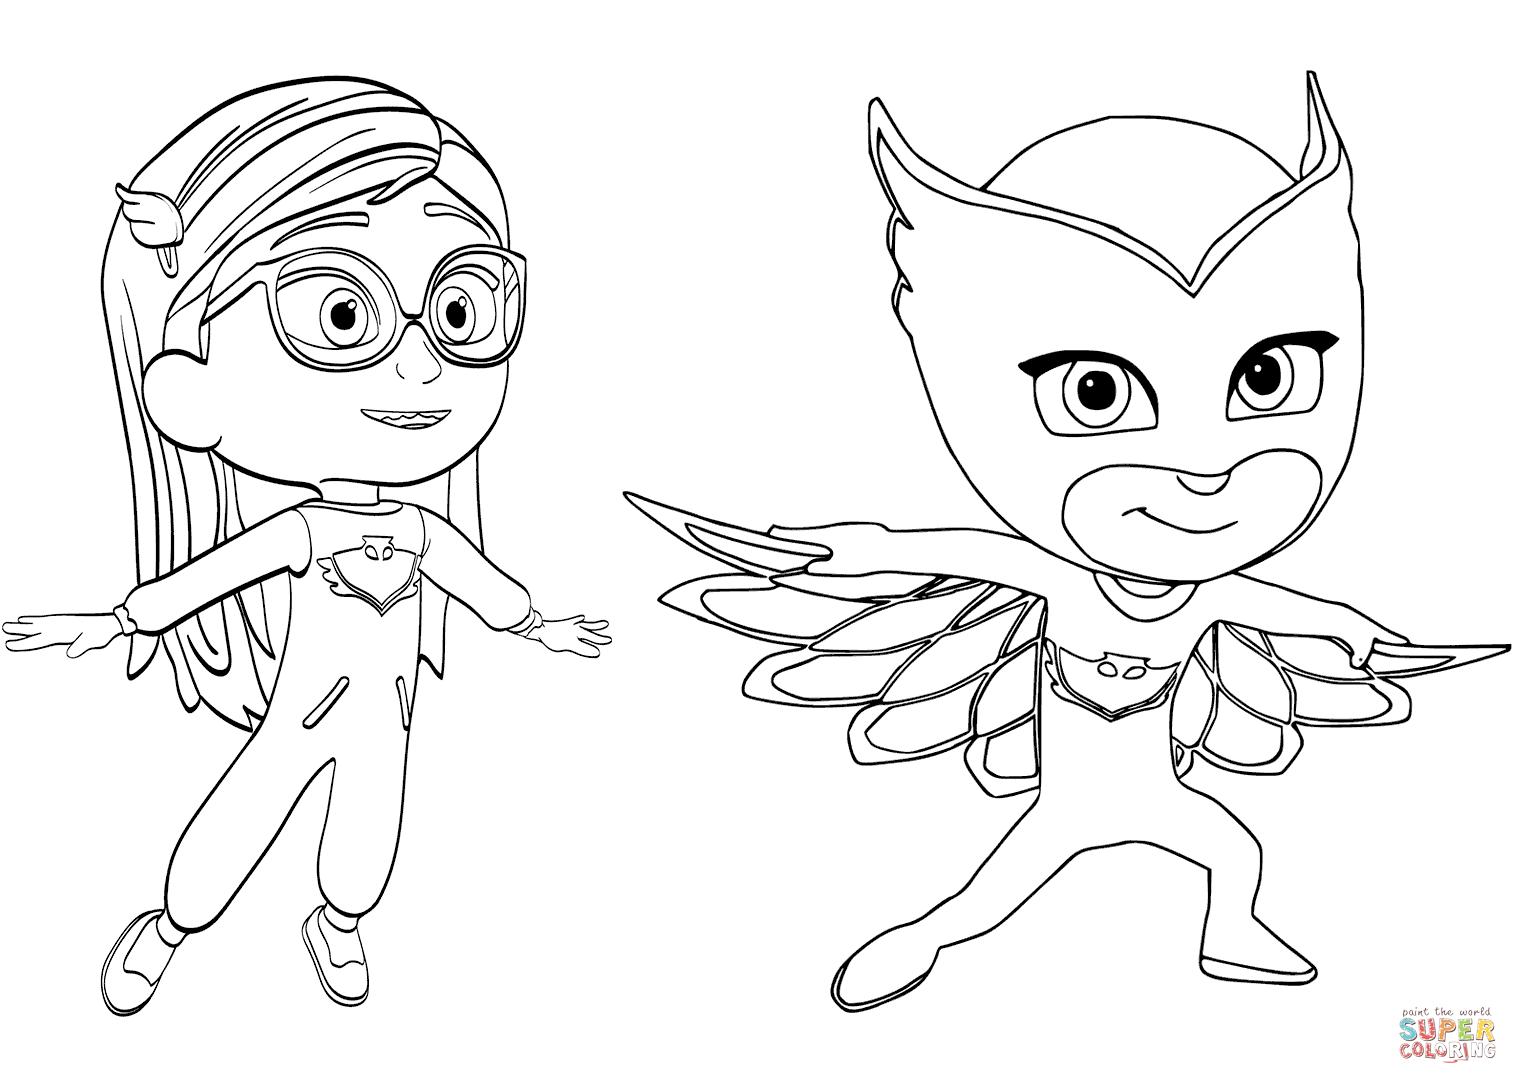 Pajama Hero Amaya Is Owlette From Pj Masks Coloring Page Free